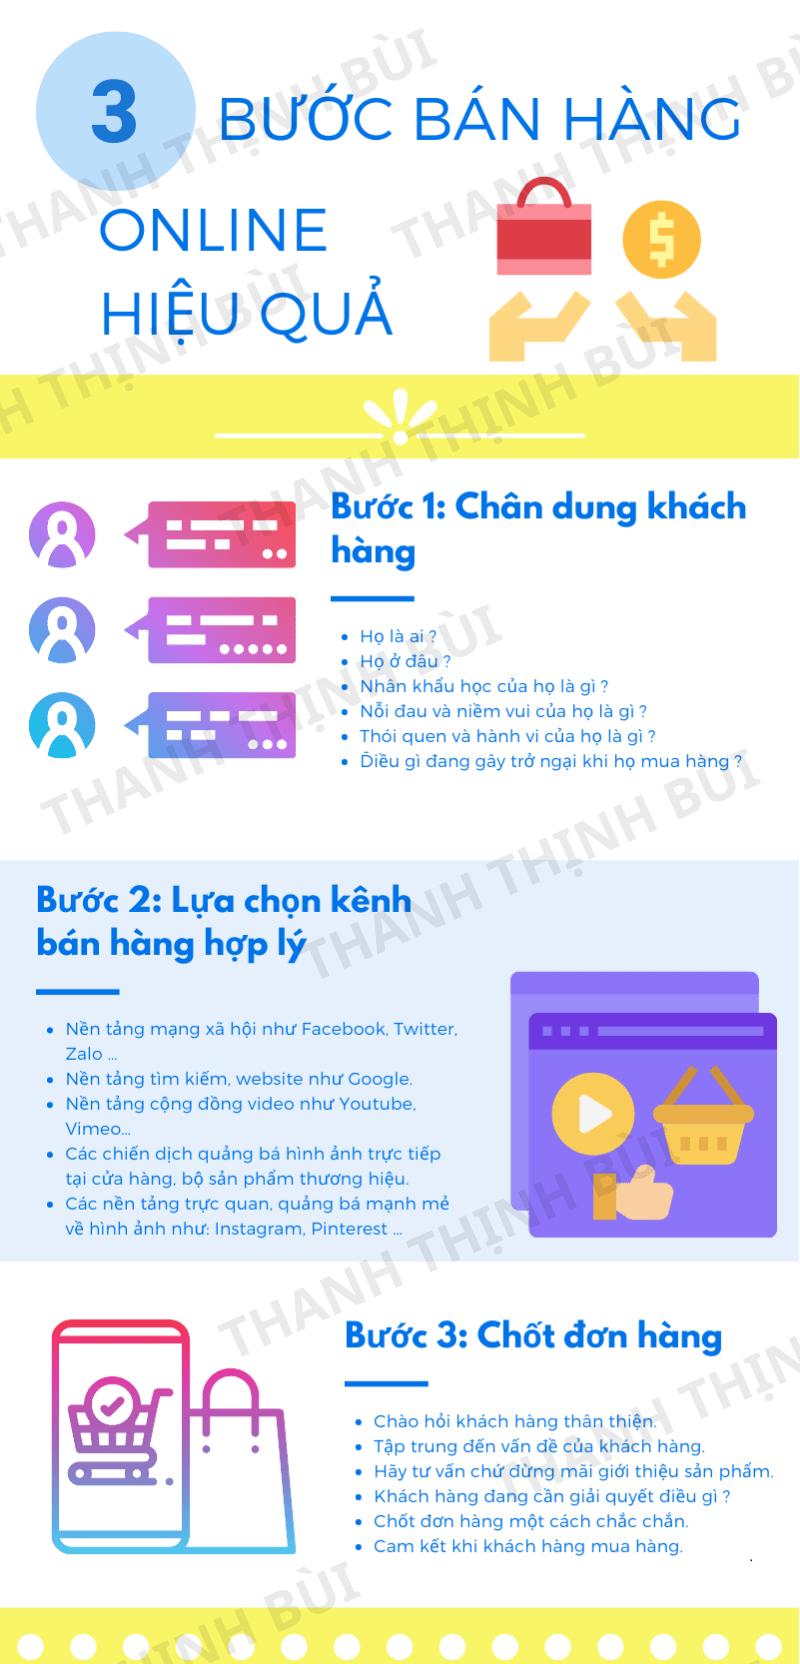 tai-sao-ban-hang-online-khong-ai-mua-infographic